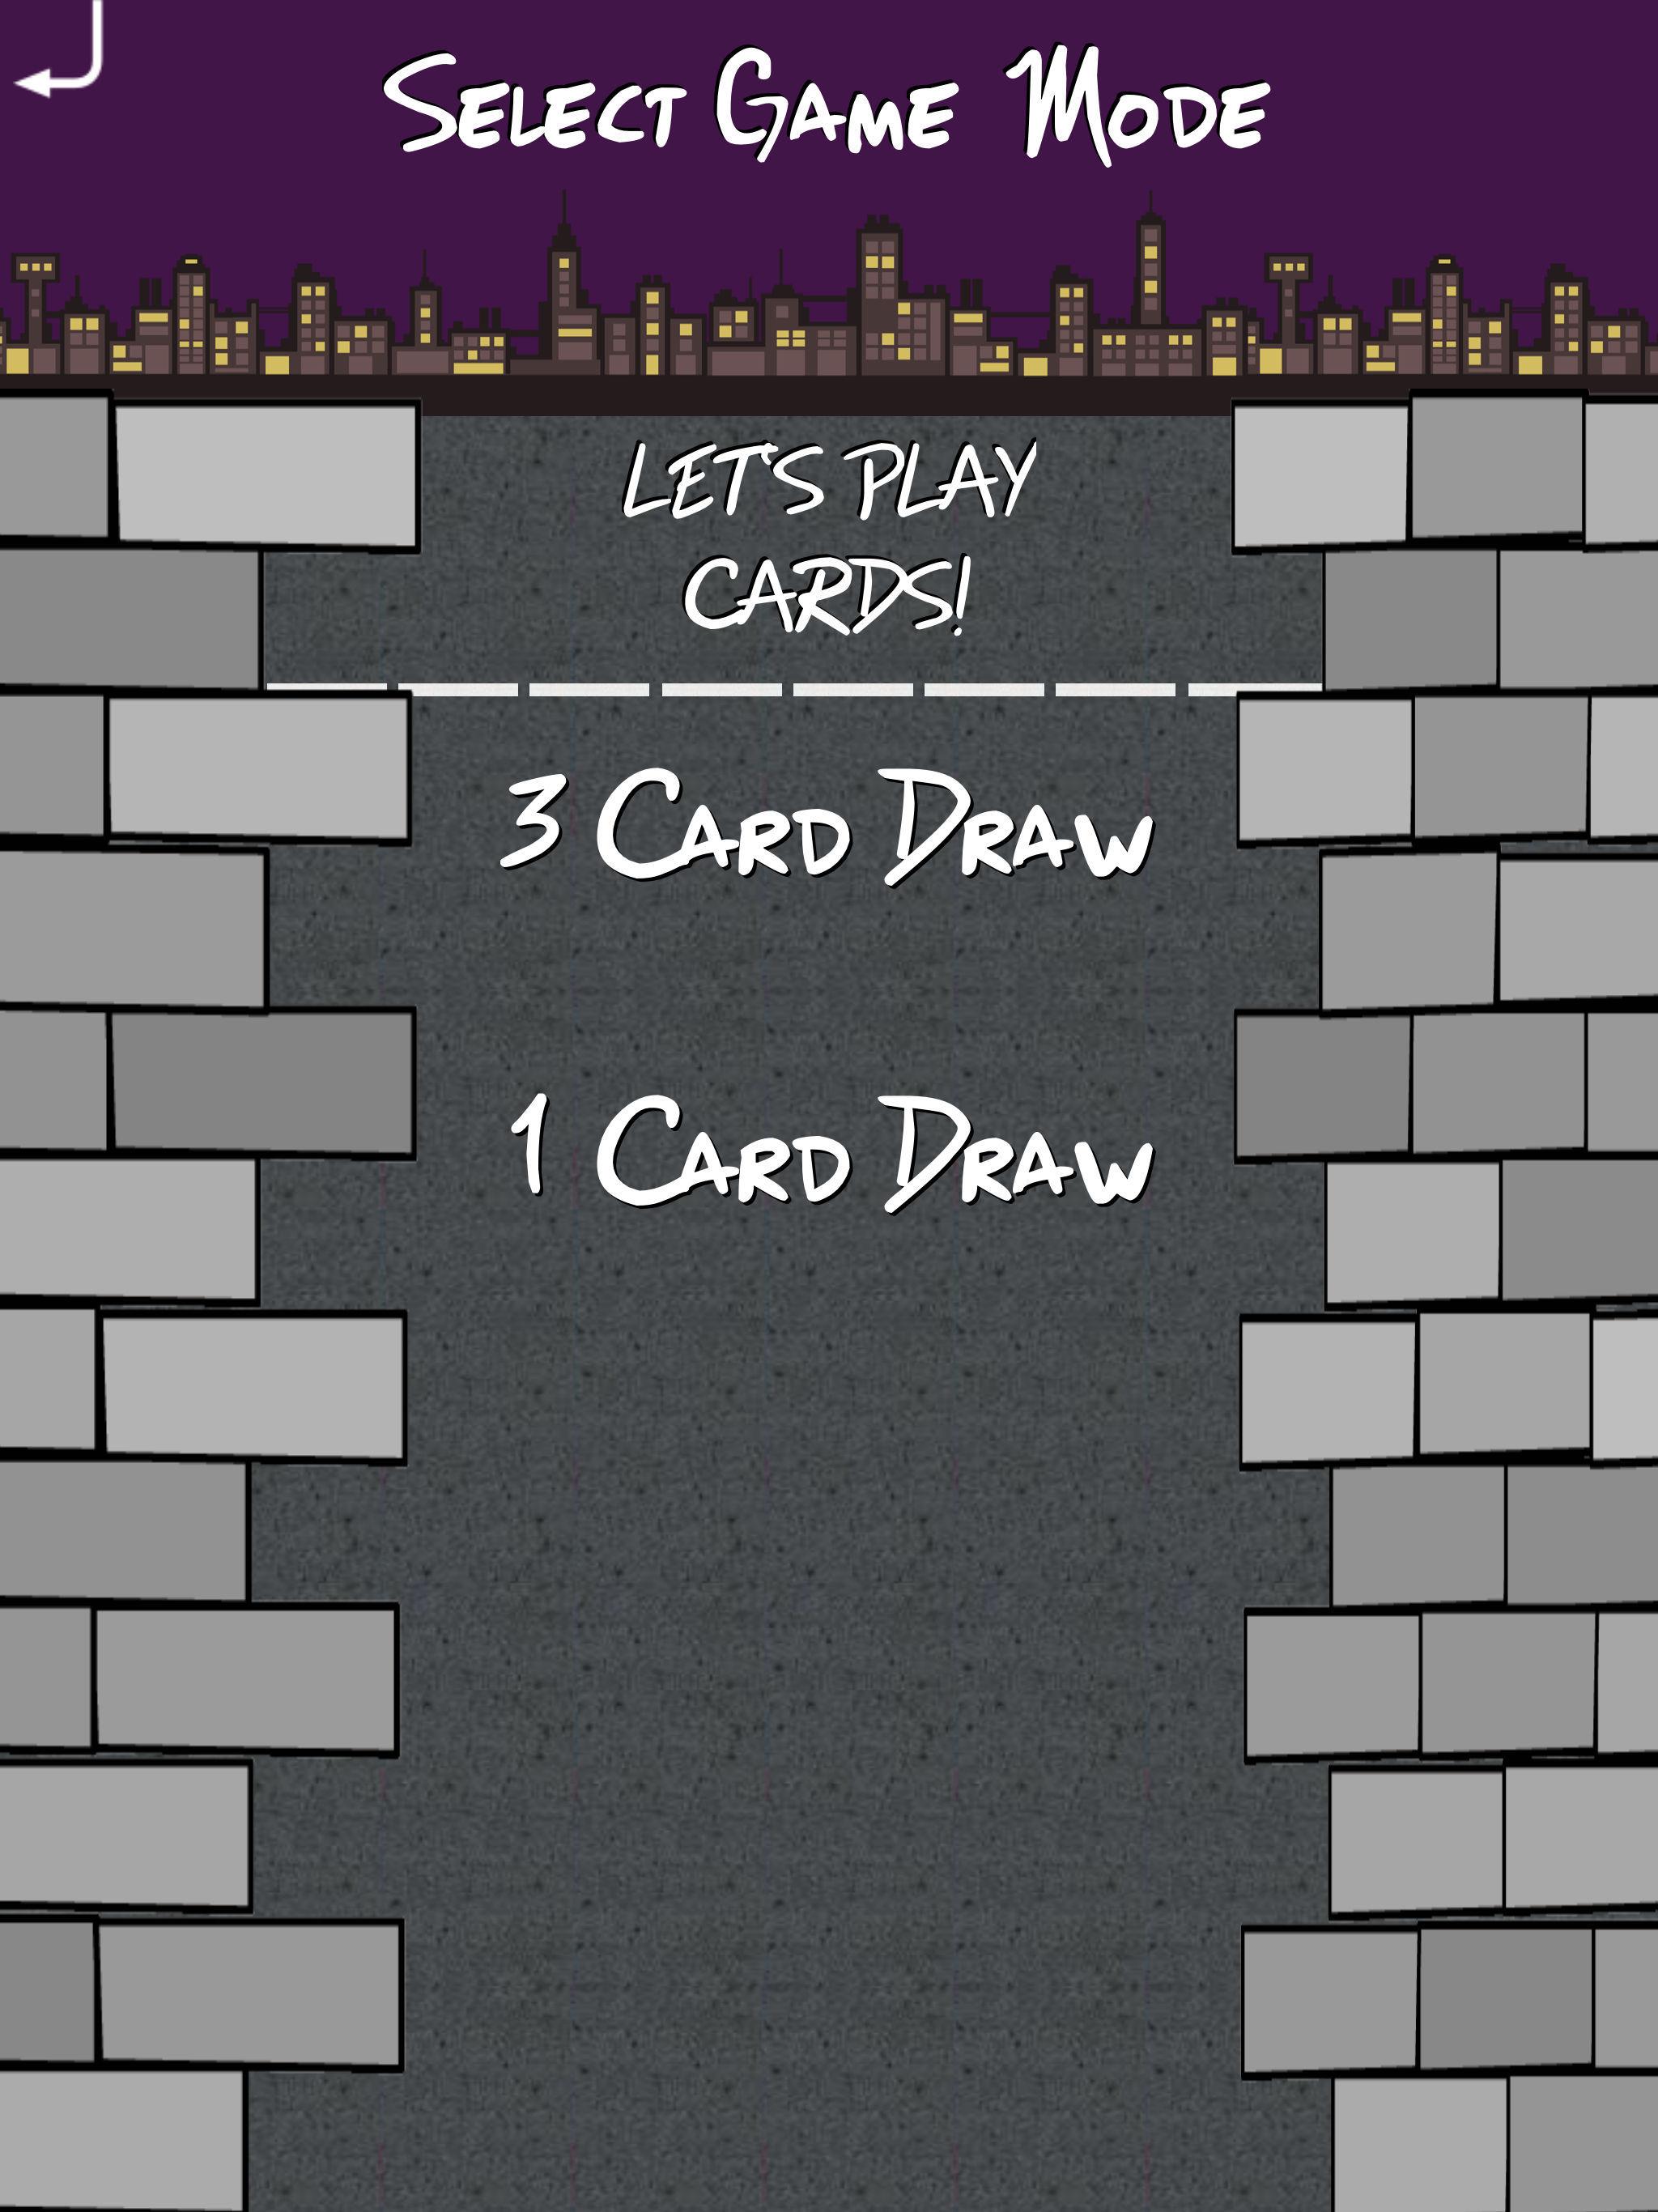 BrickCitySolitaireIpadProScreneshotSelectGameMode